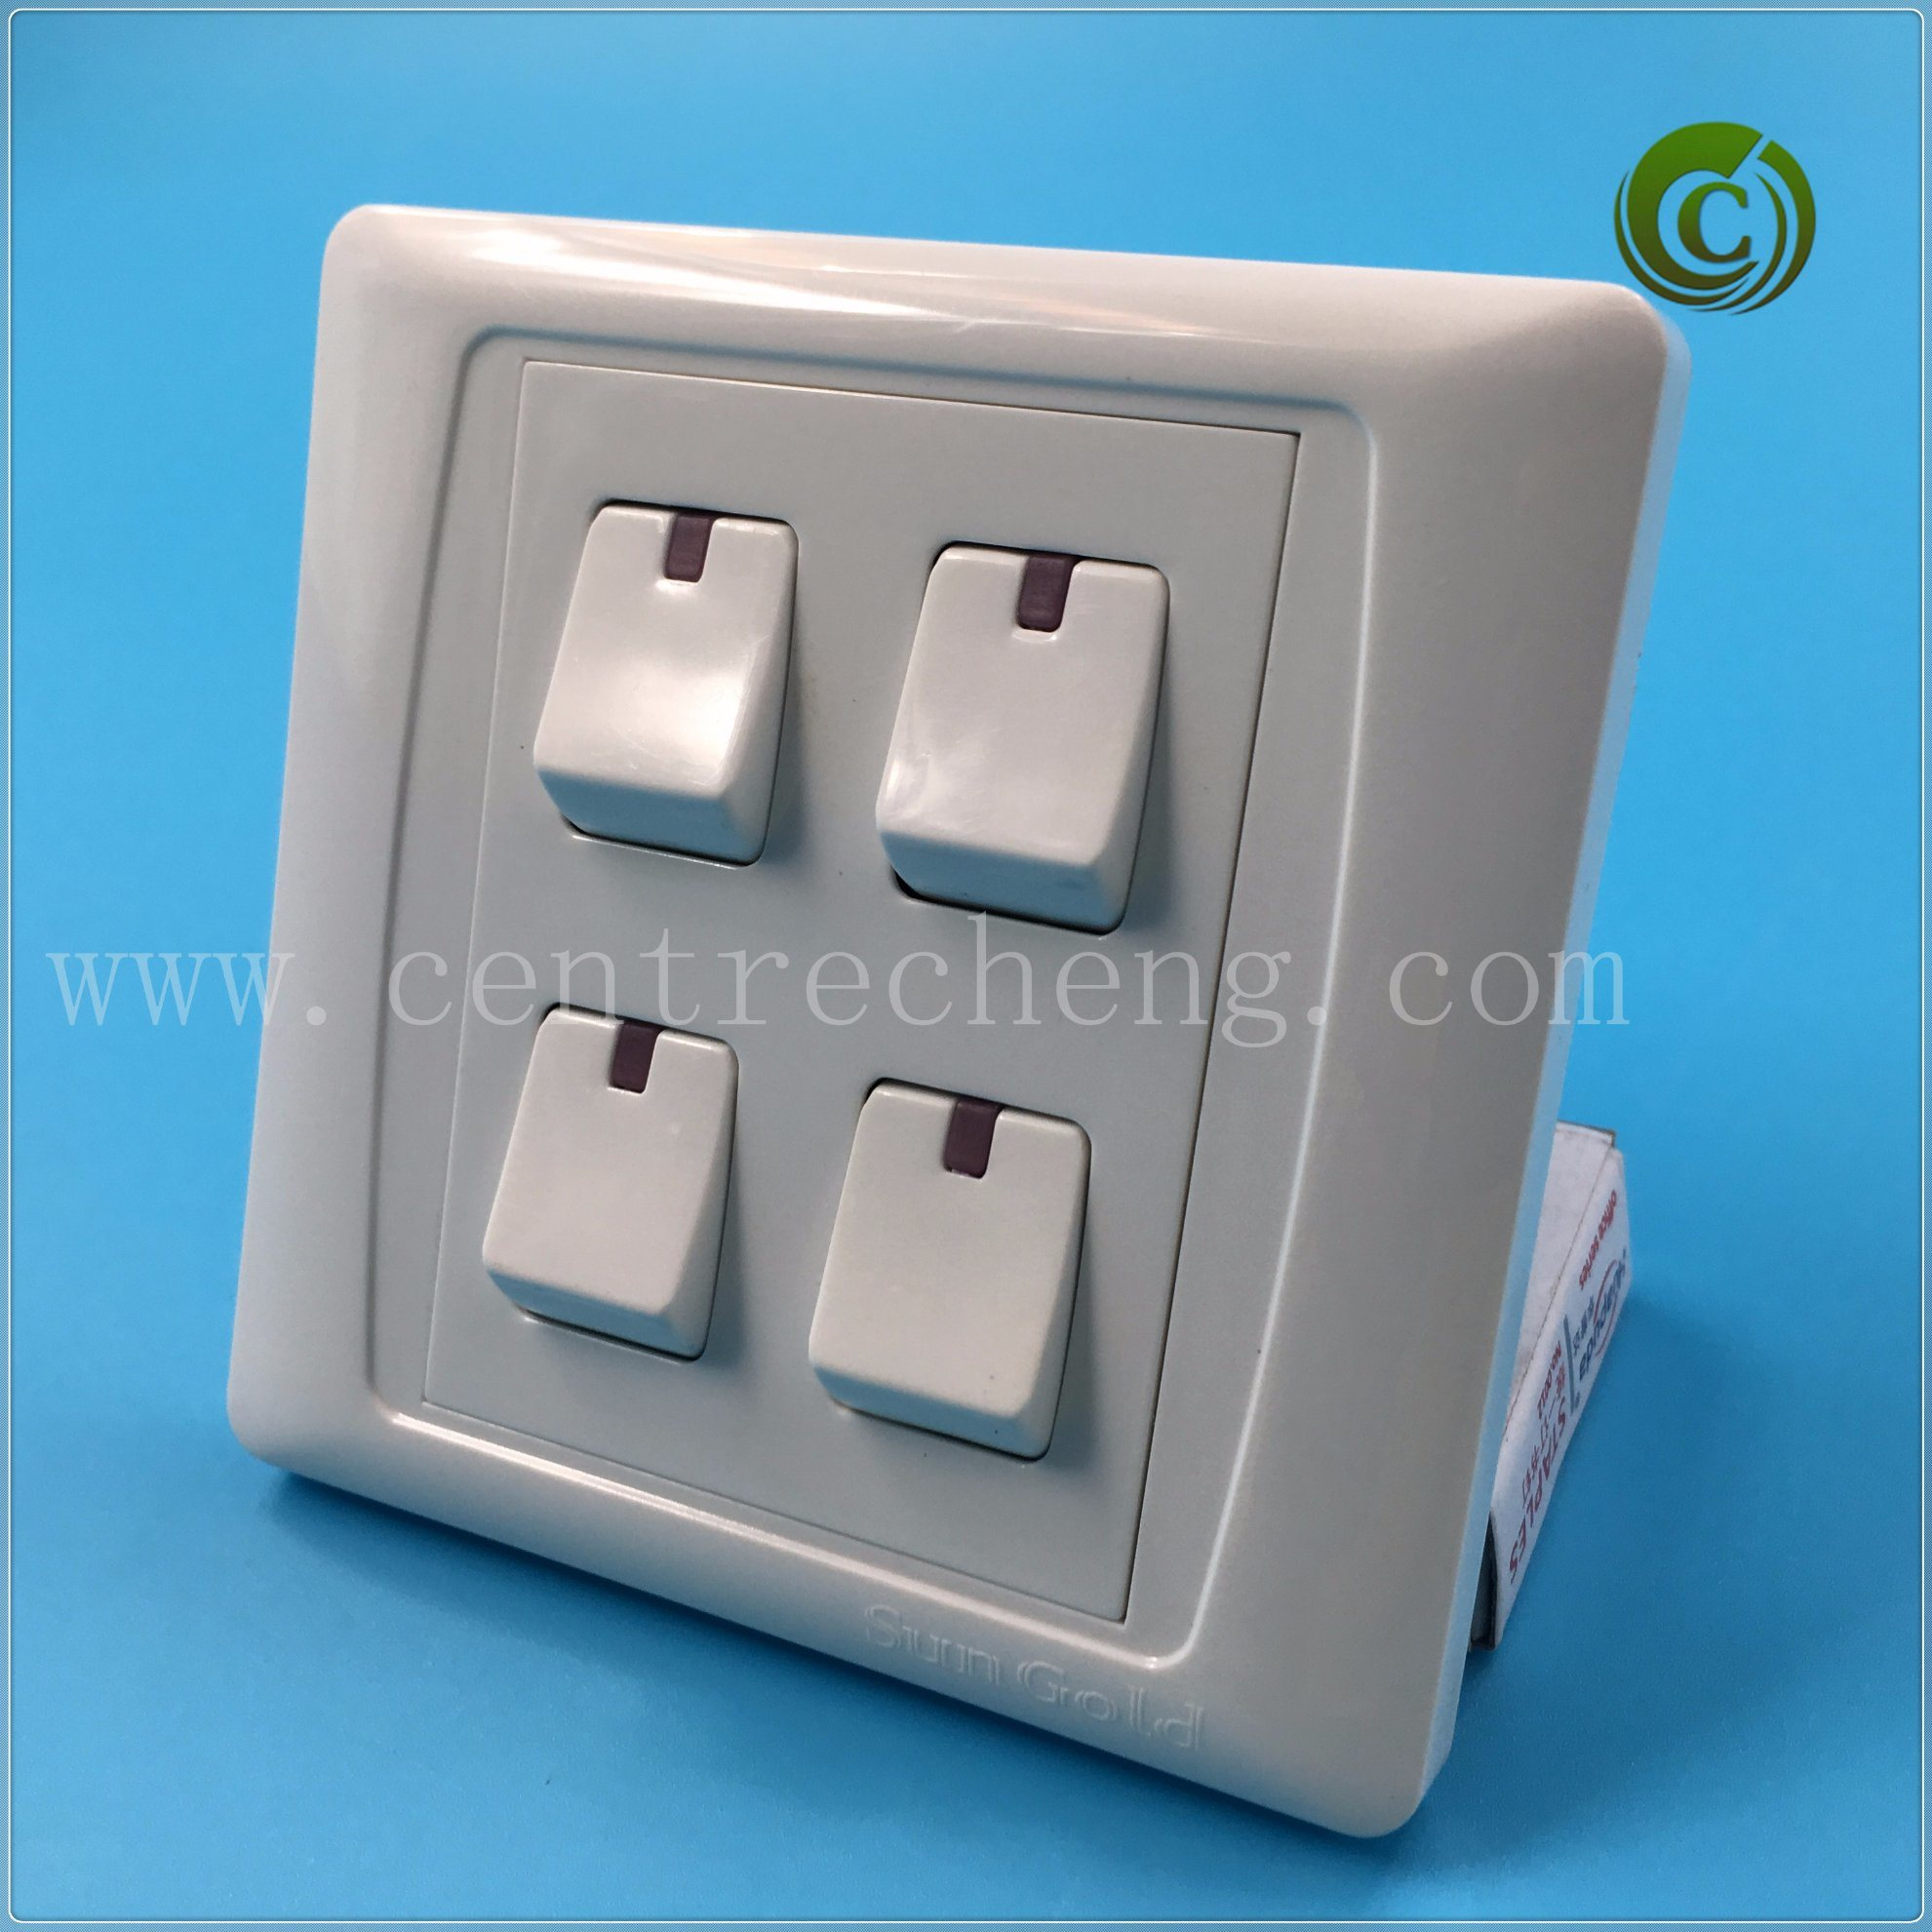 China 3 Gang 2 Way Switch White Wall Electrical Light